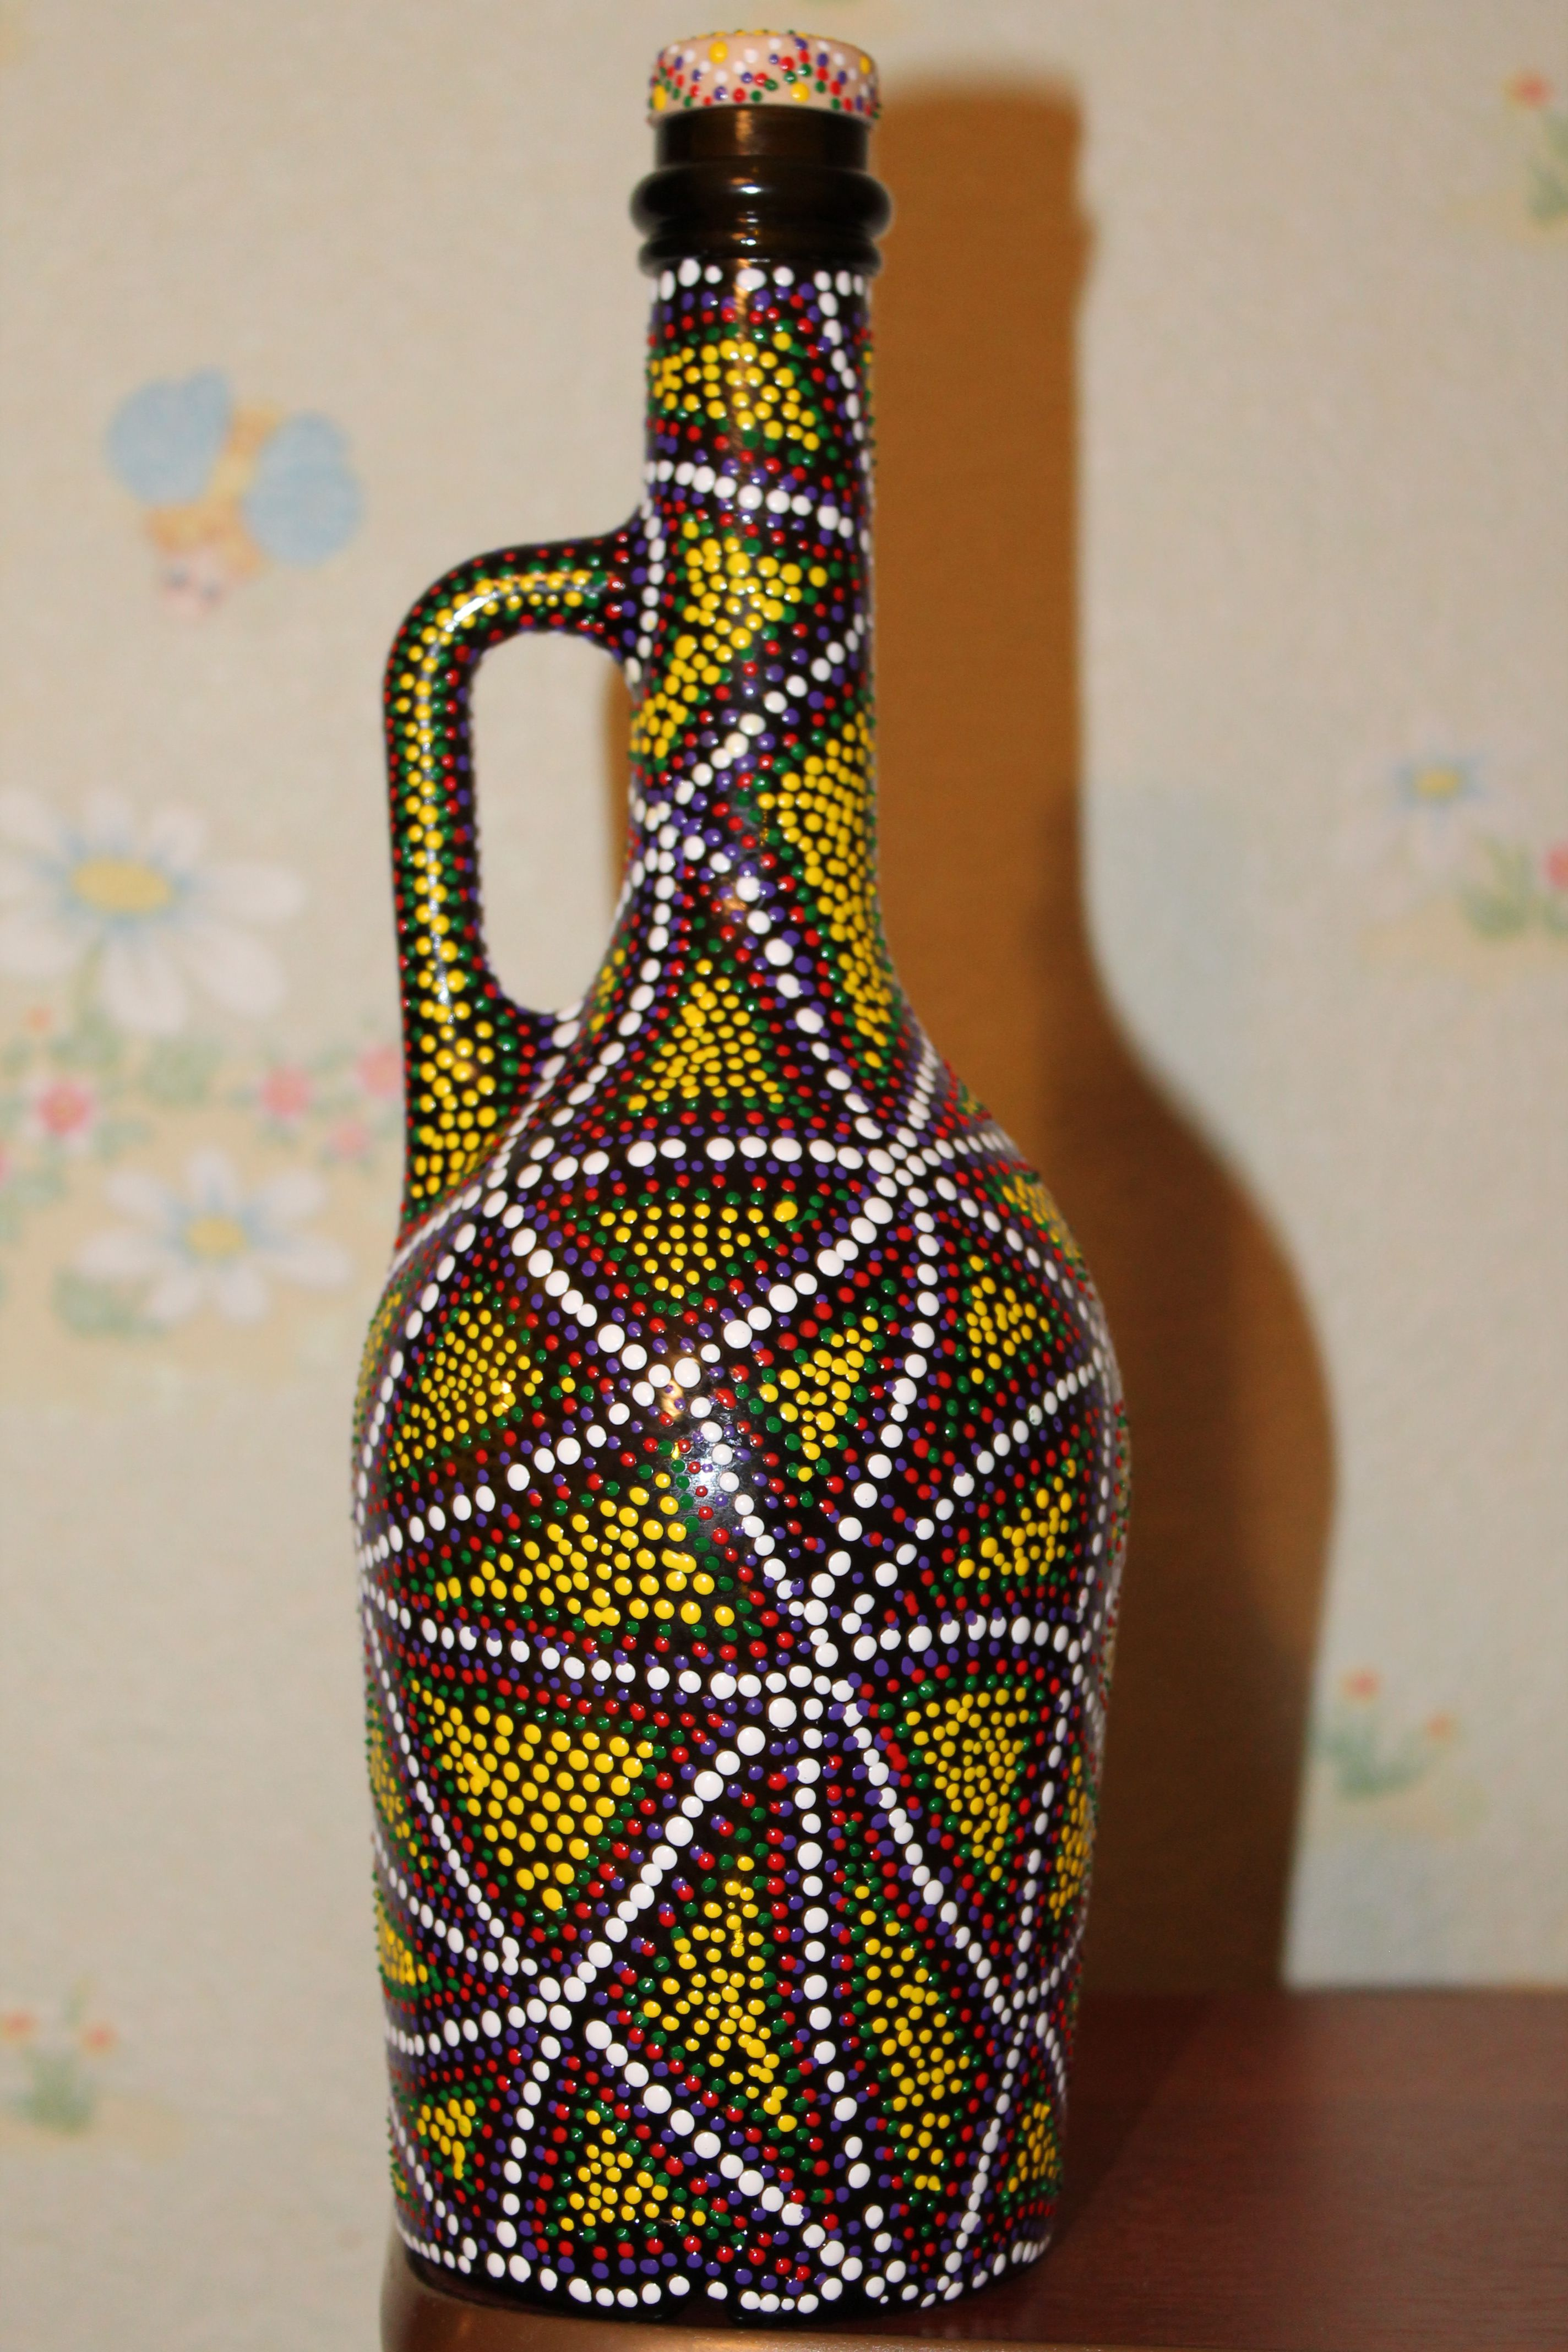 decoration interior dotpainting gifts handmade bottle